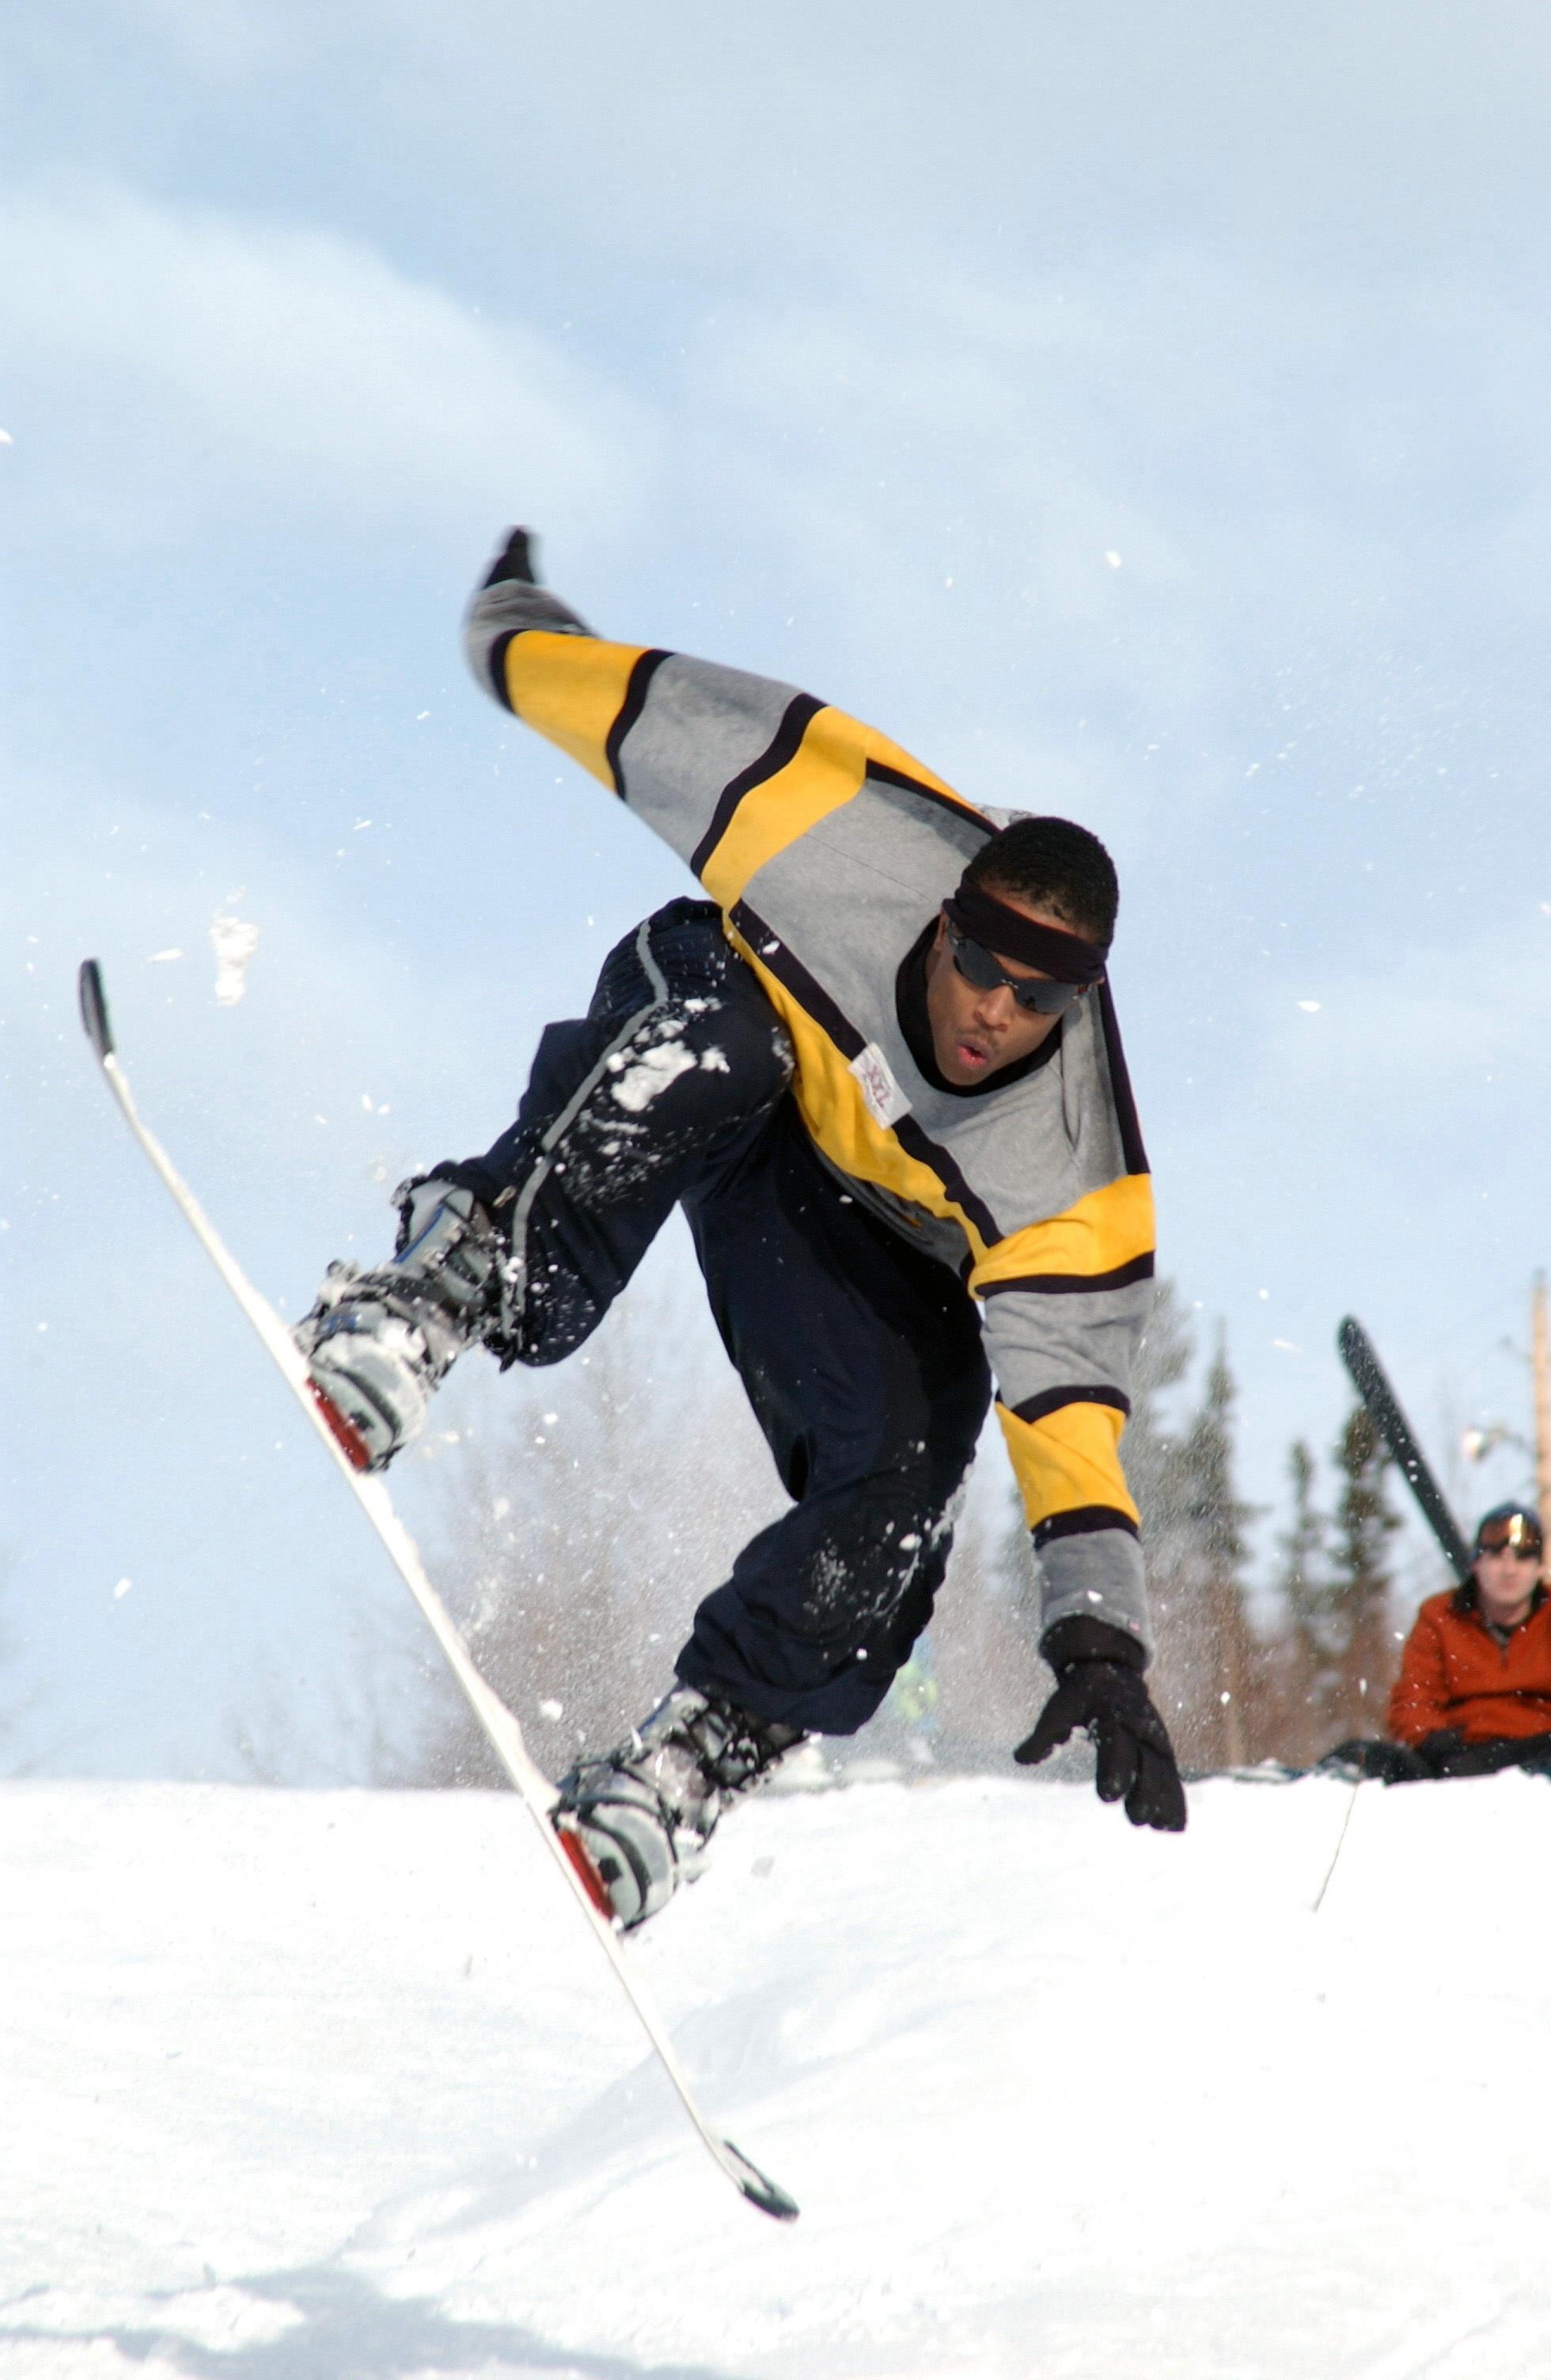 Man Riding A White Snowboard During Daytime 183 Free Stock Photo